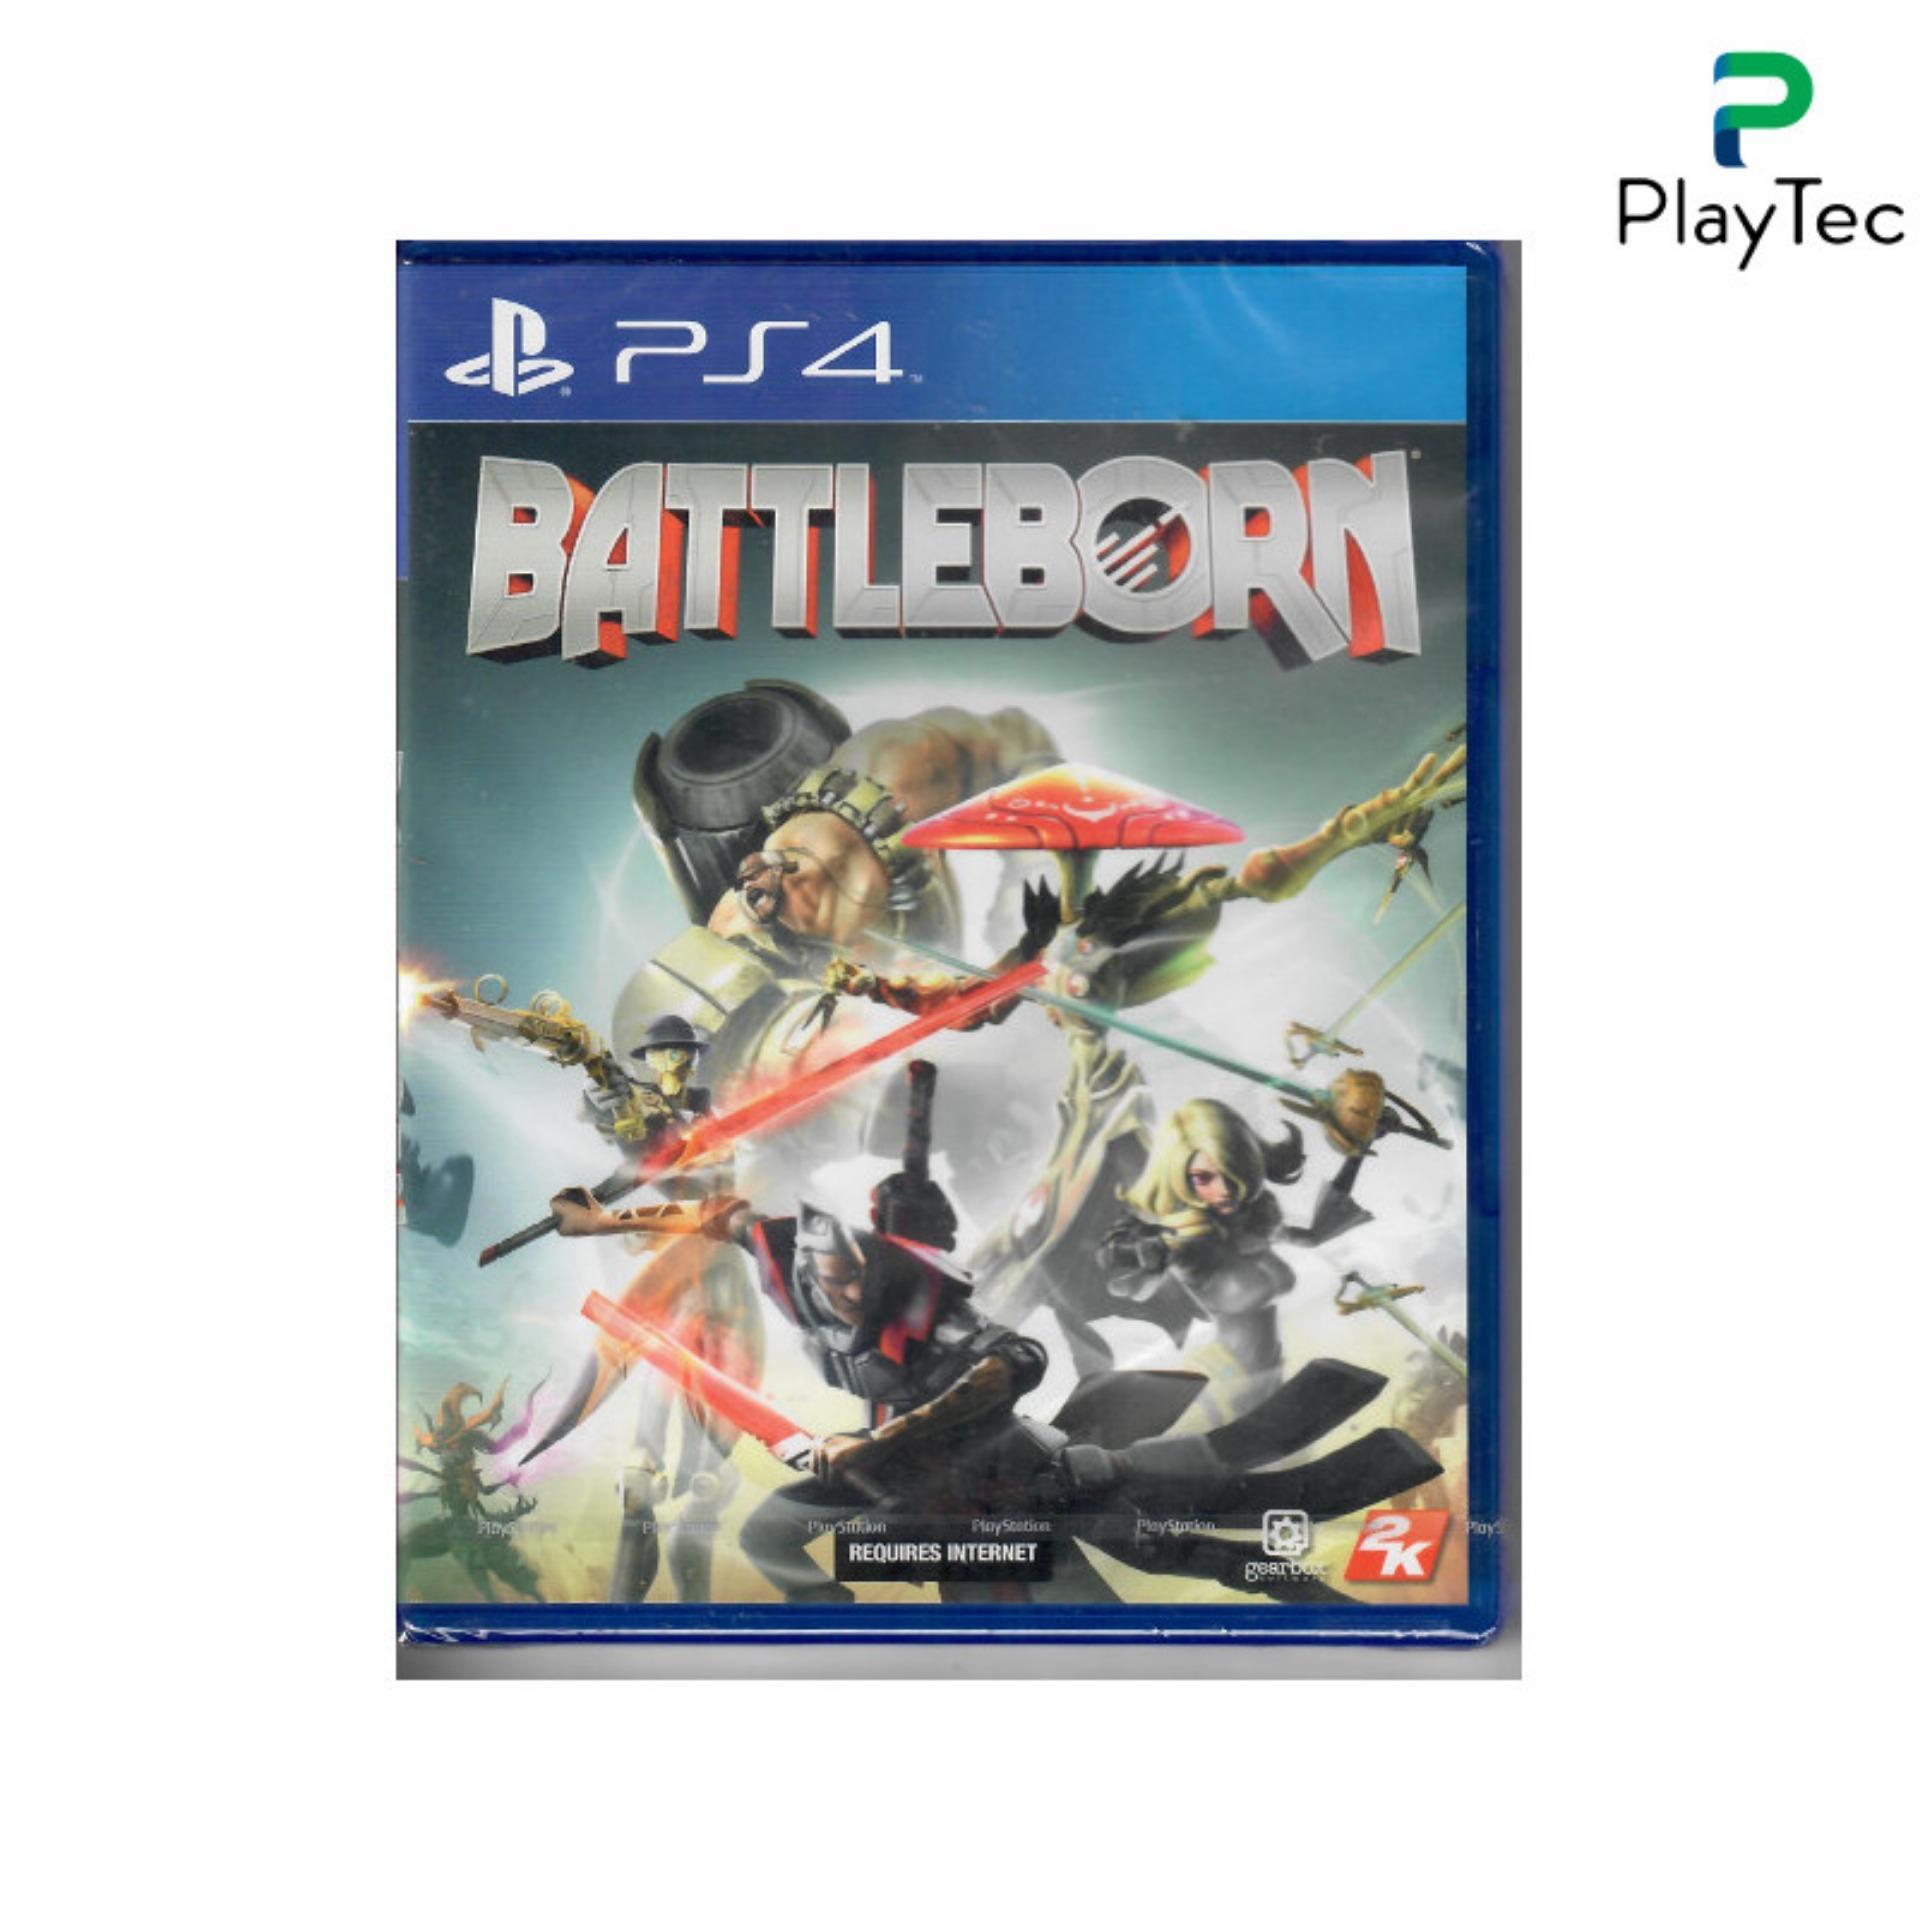 PS4 Battleborn (R3)